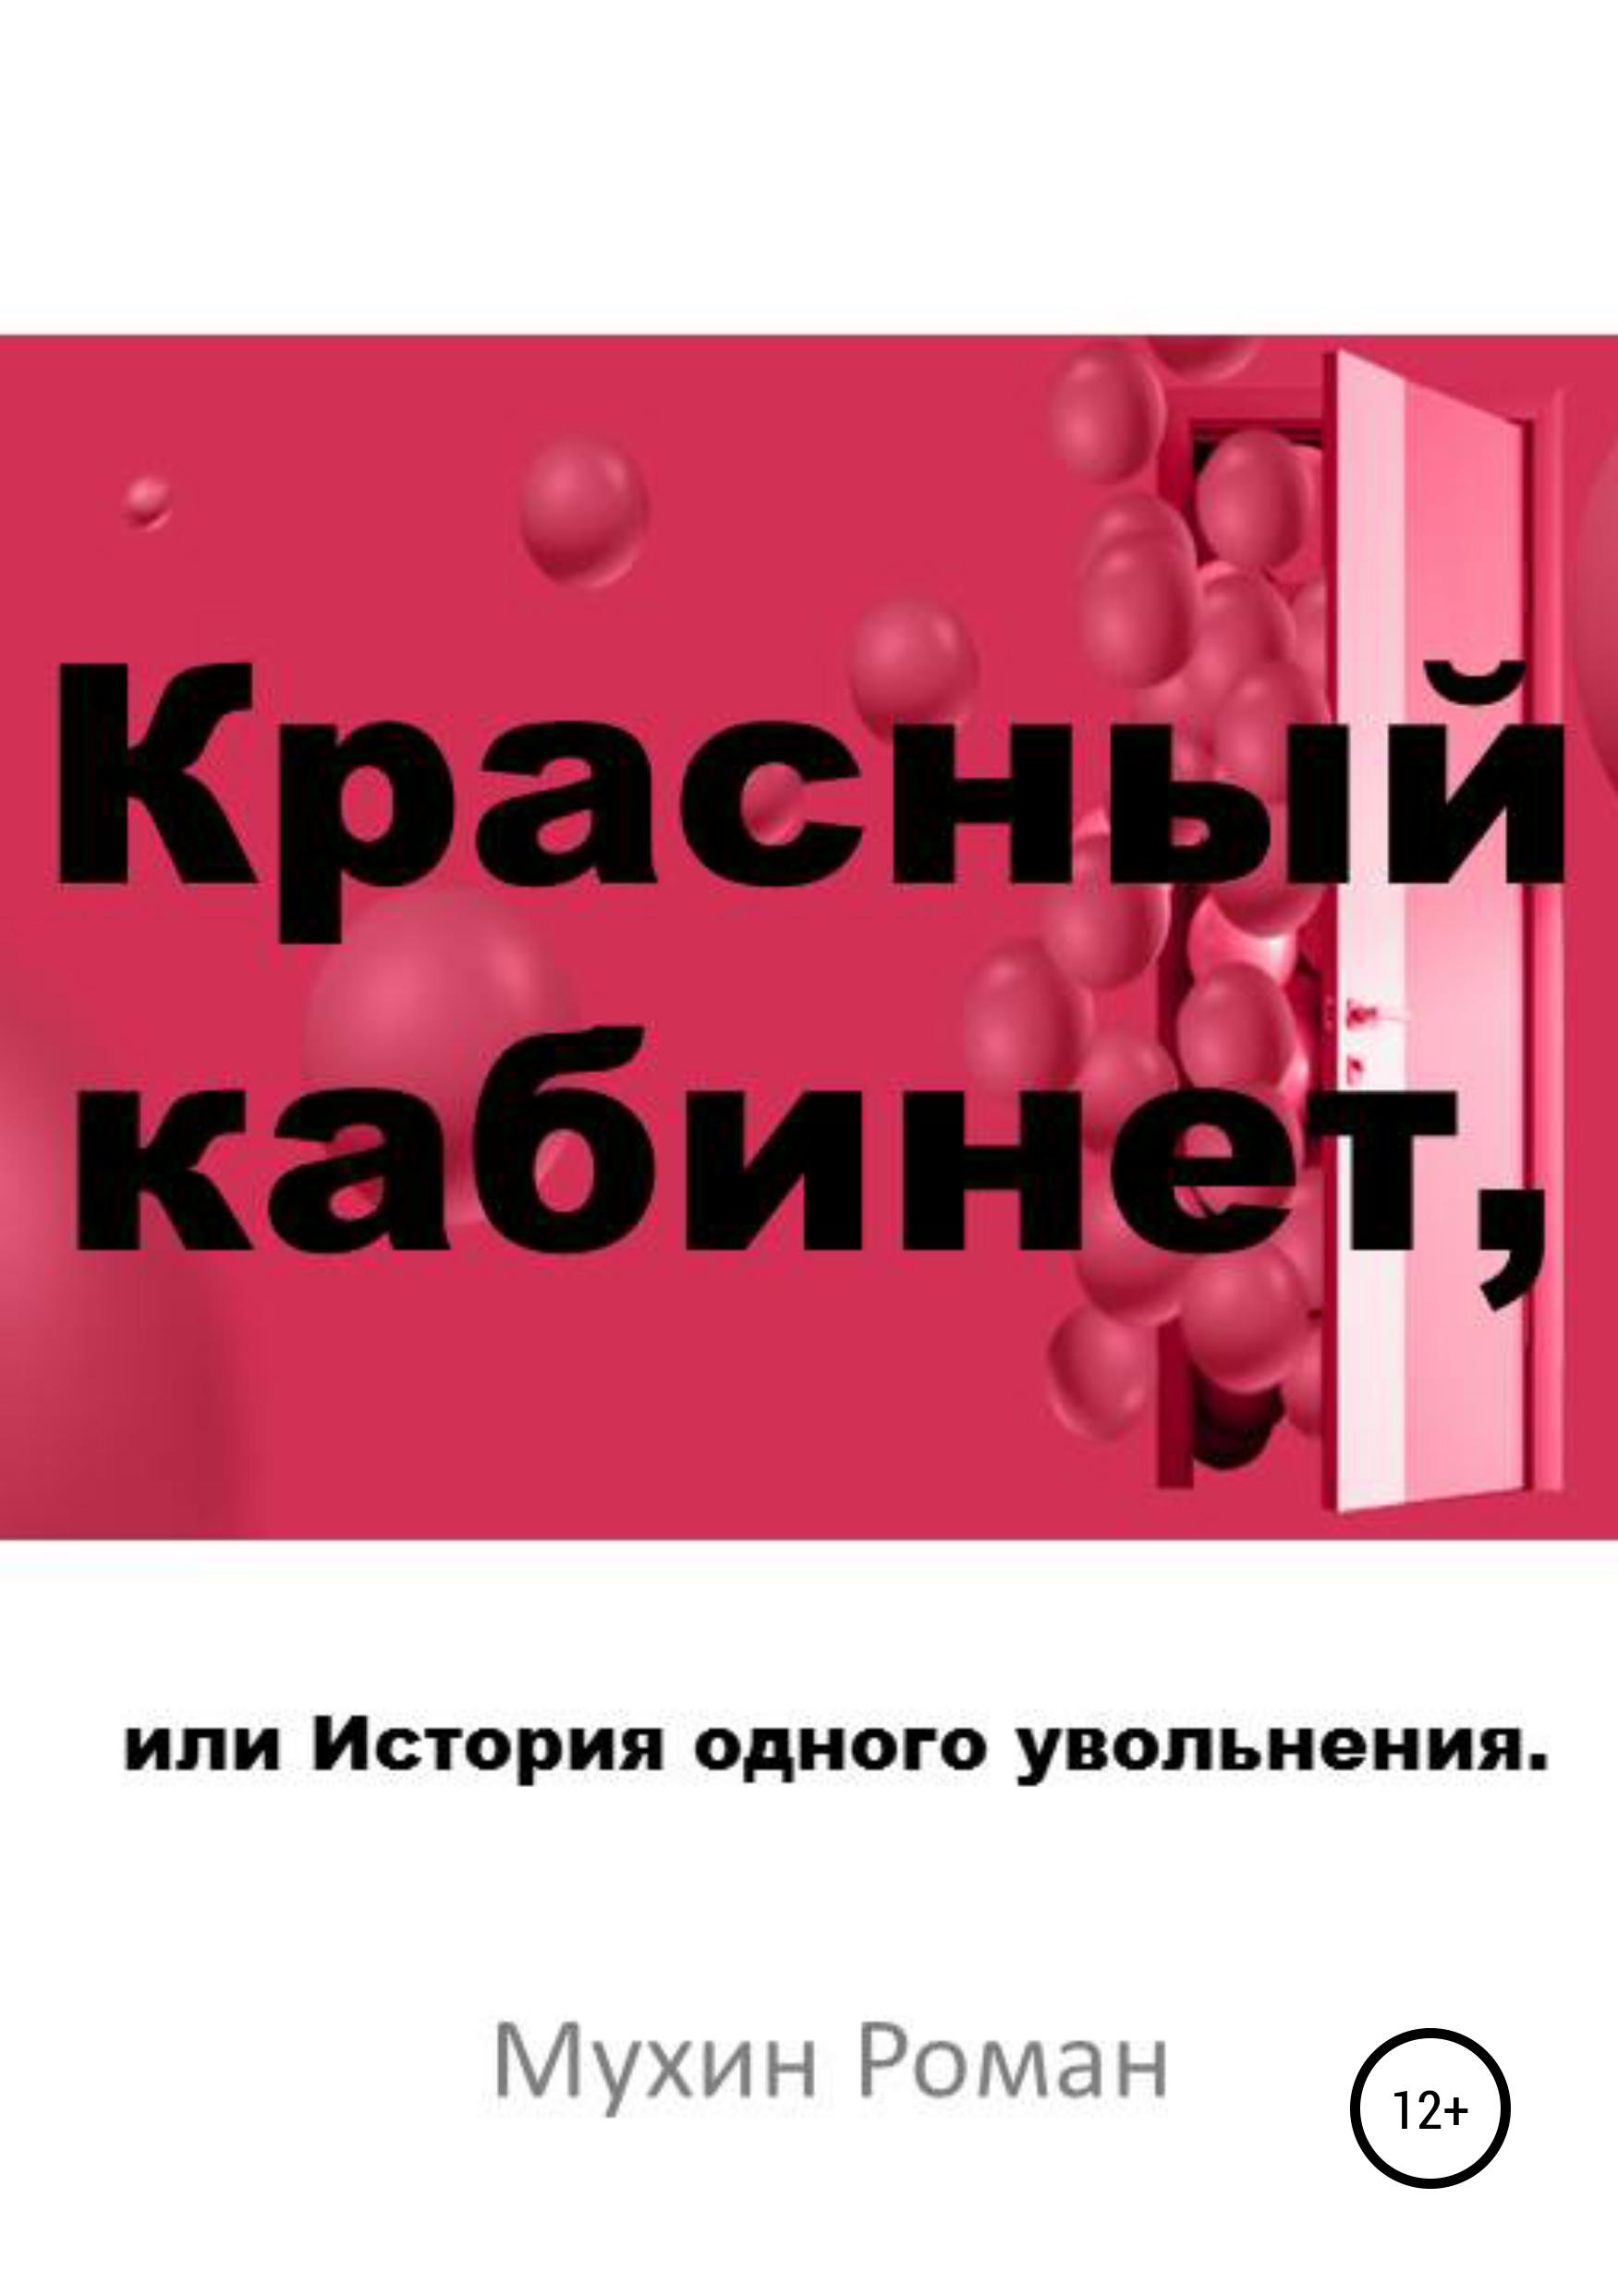 Обложка книги. Автор - Роман Мухин